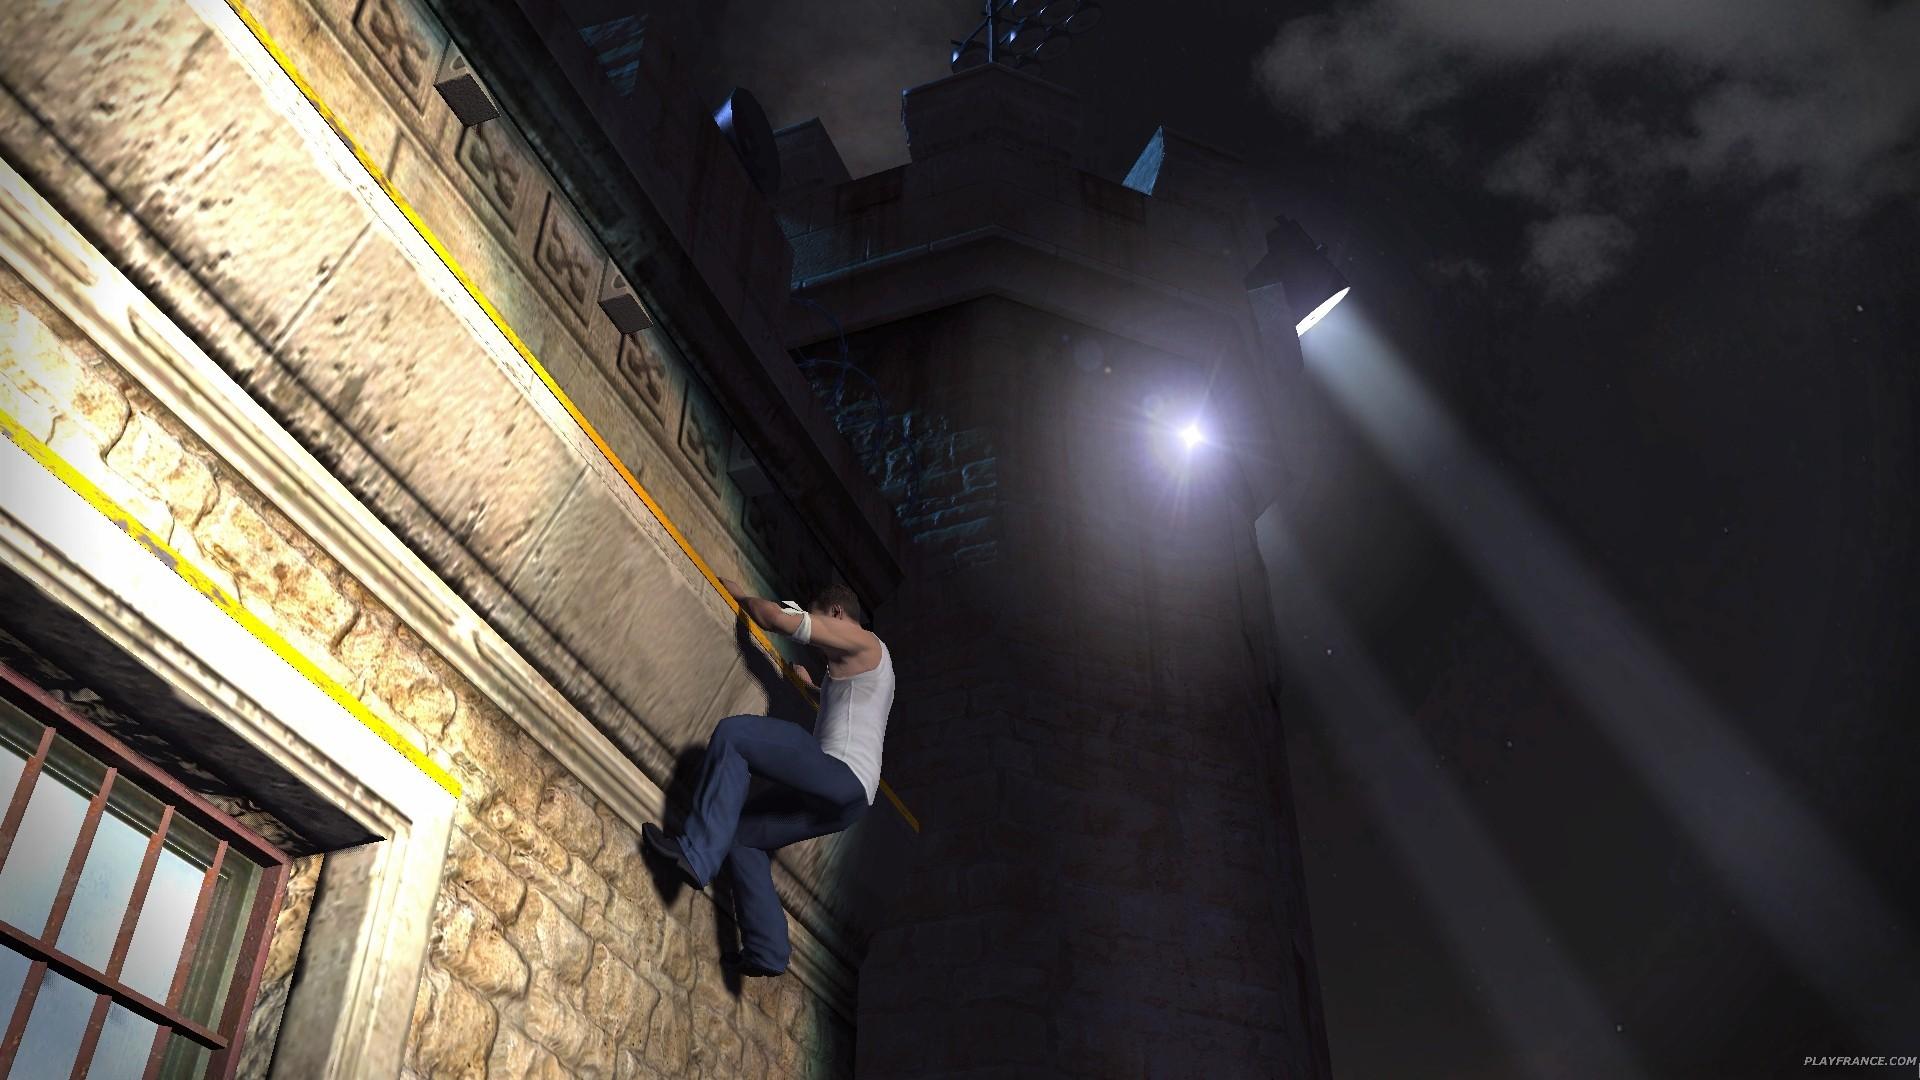 http://images.playfrance.com/5/8556/zoom/7297.jpg